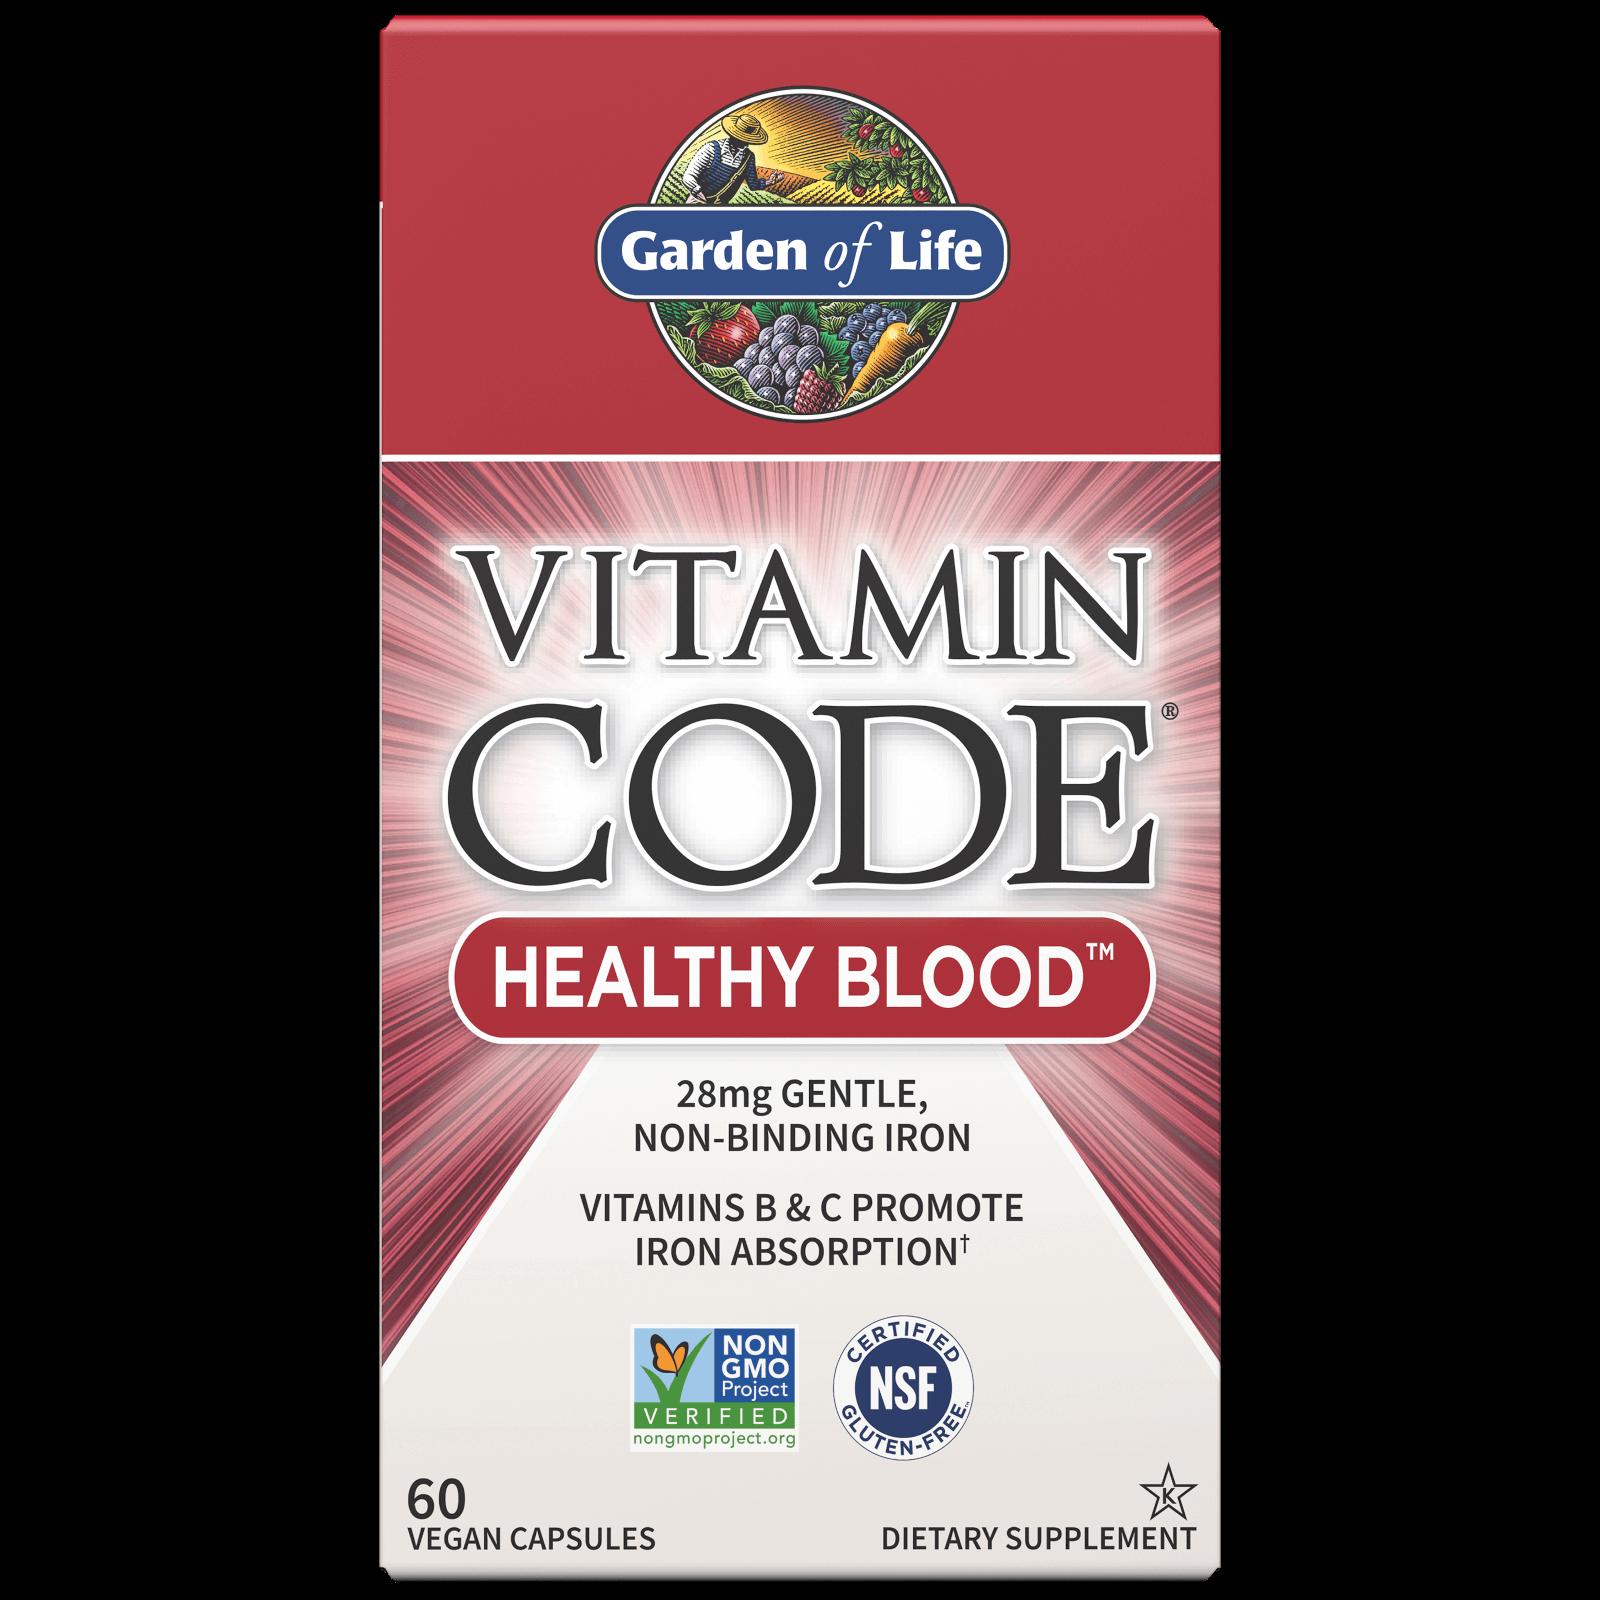 Vitamine Code Healthy Blood - 60 capsules